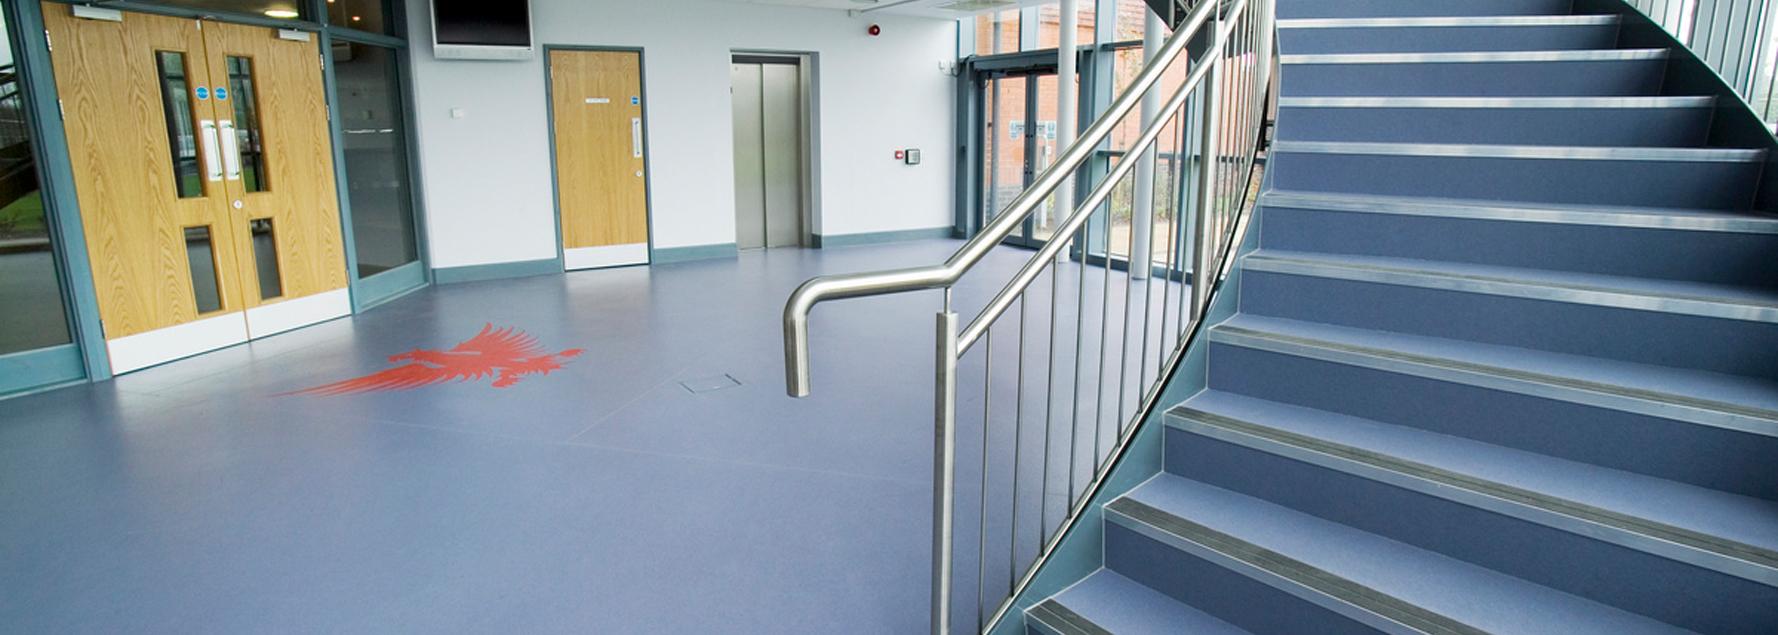 School Stairs1